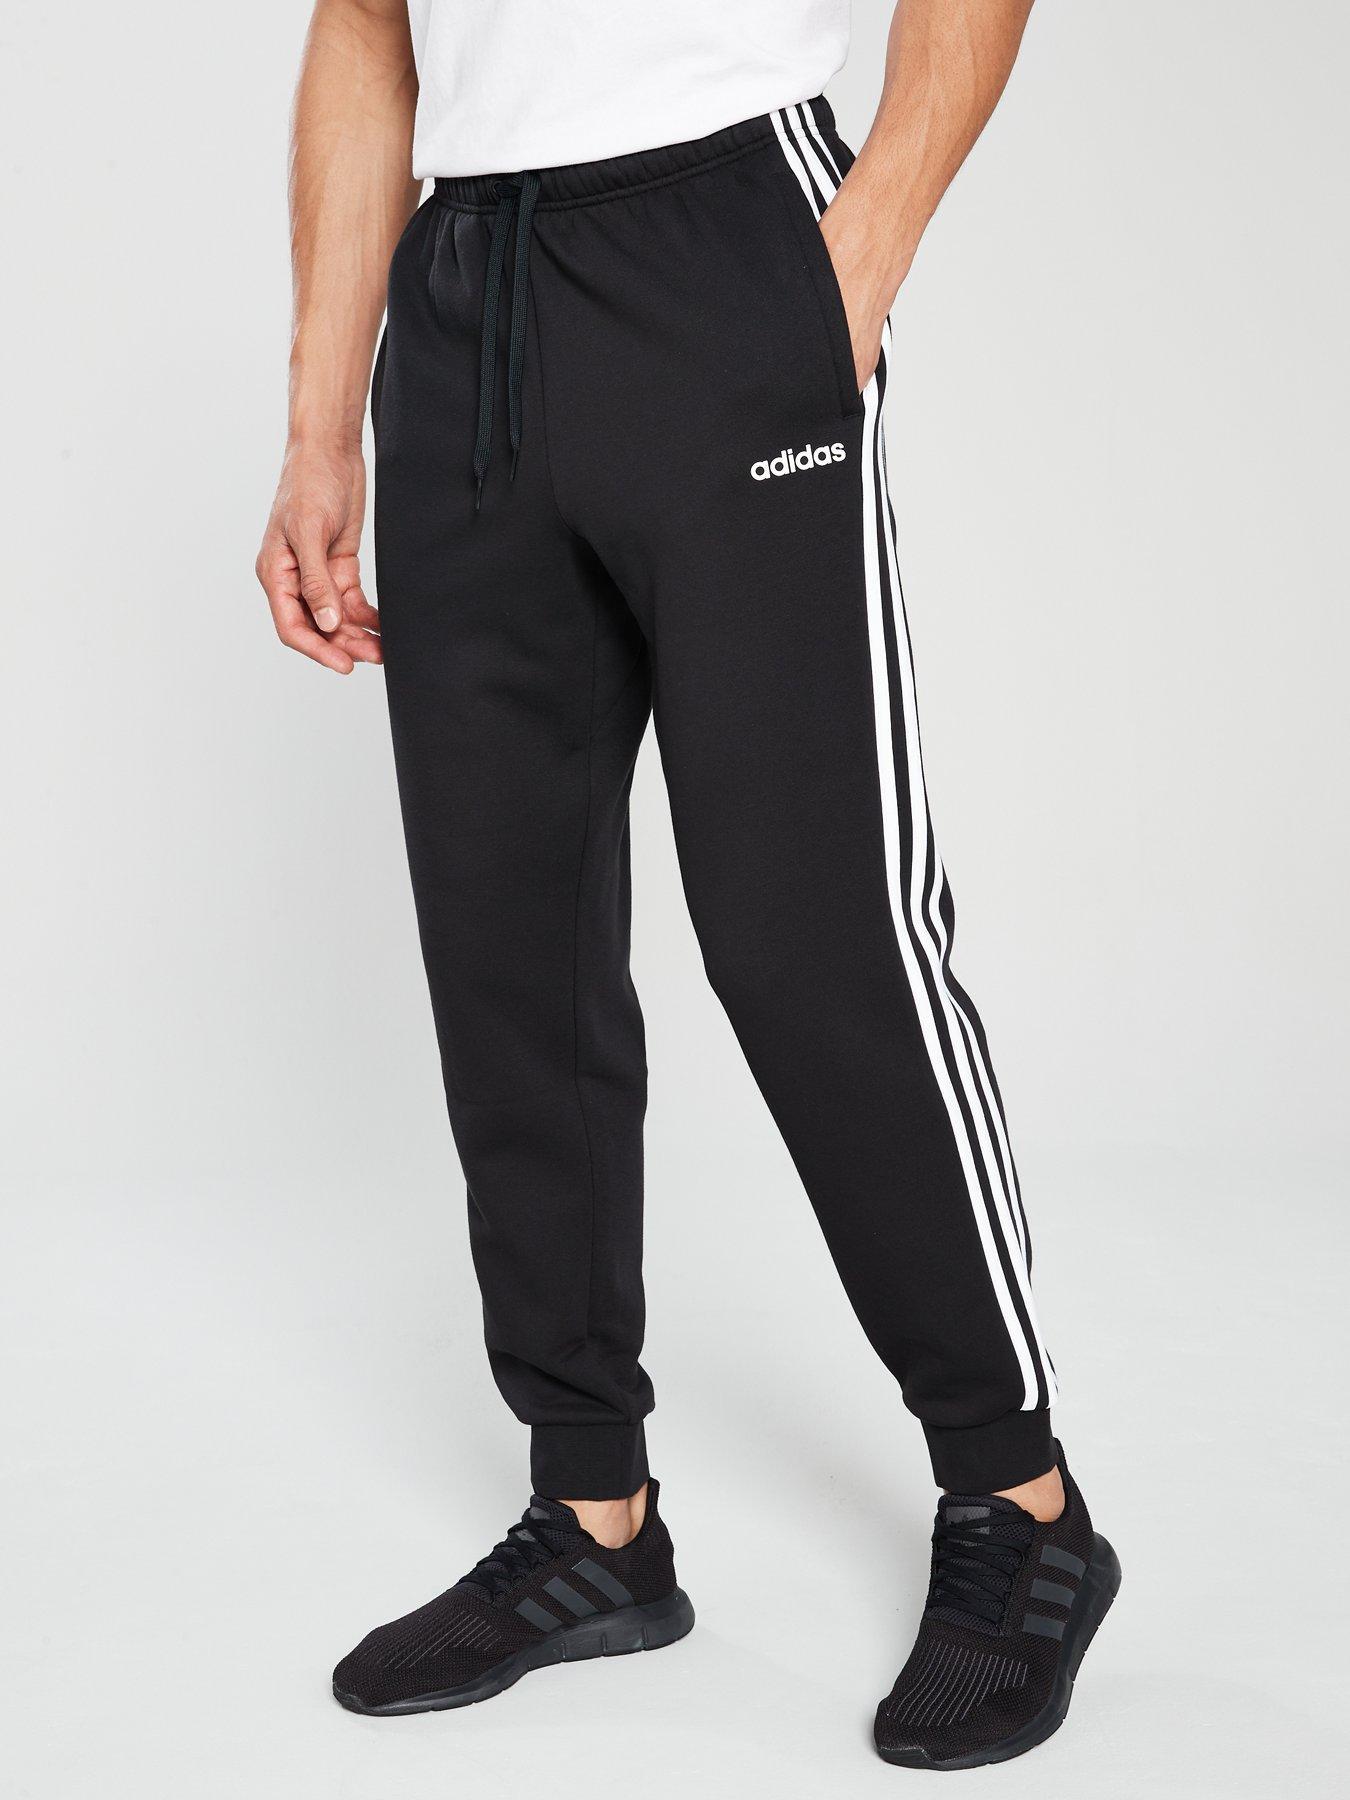 Adidas   Jogging bottoms   Sportswear   Men   very.co.uk